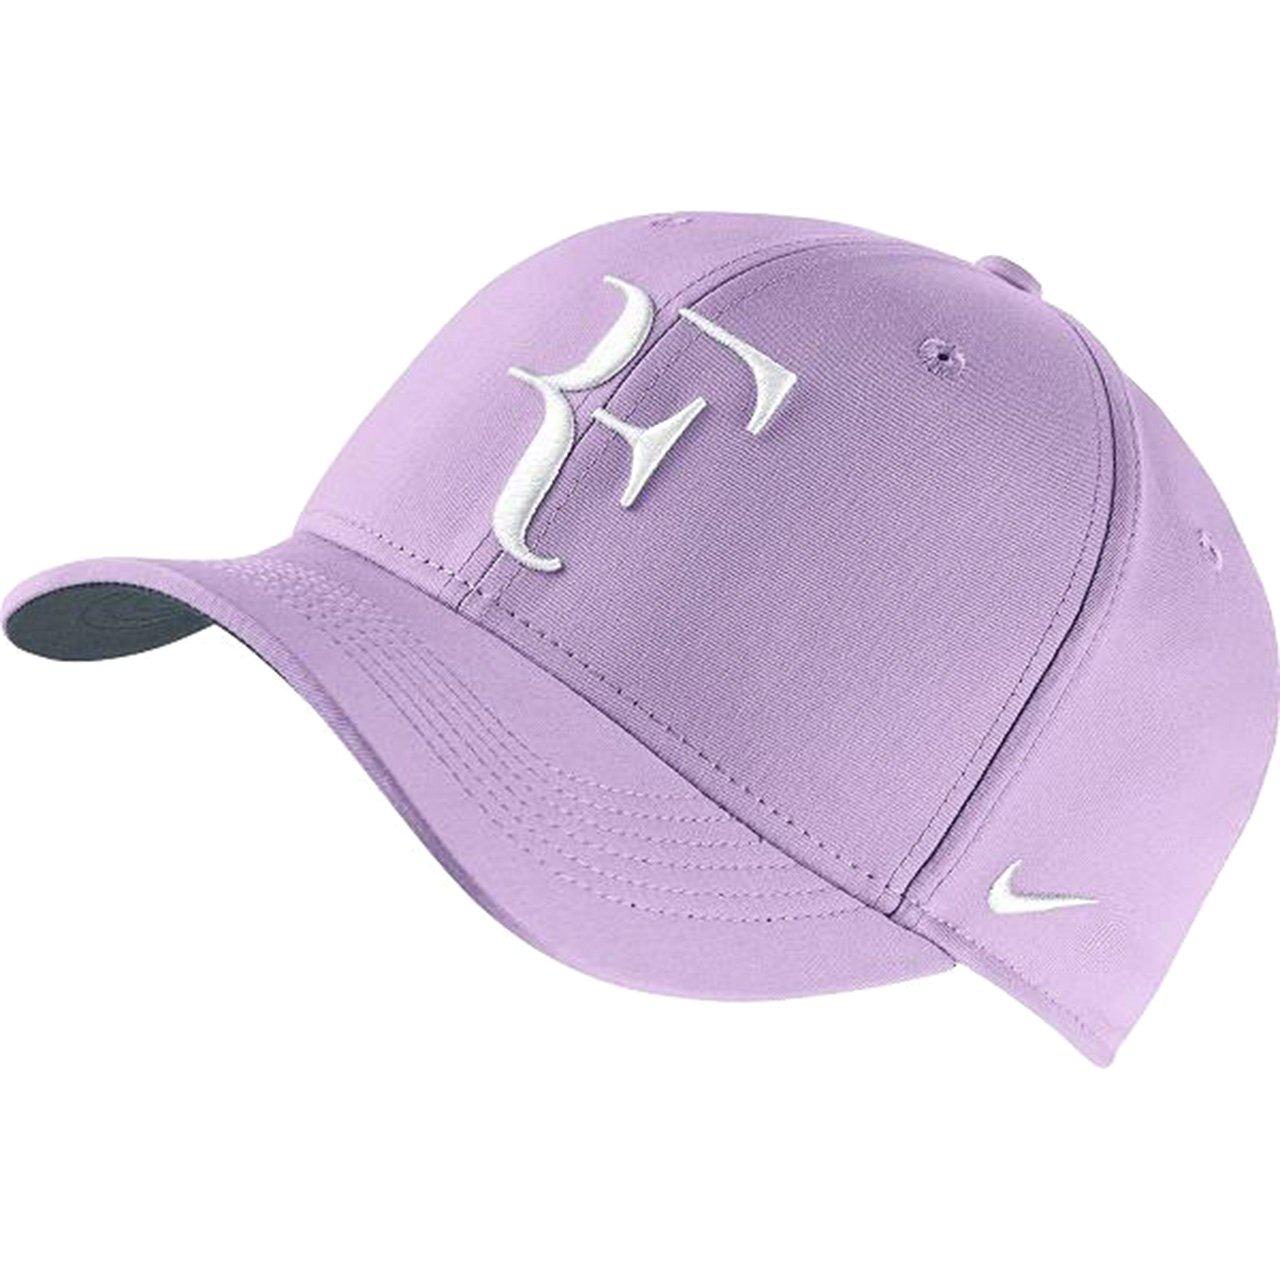 Nike Roger Federer Aerobill Baseball Cap Adult Unisex at Amazon Men s  Clothing store  35abf735e09